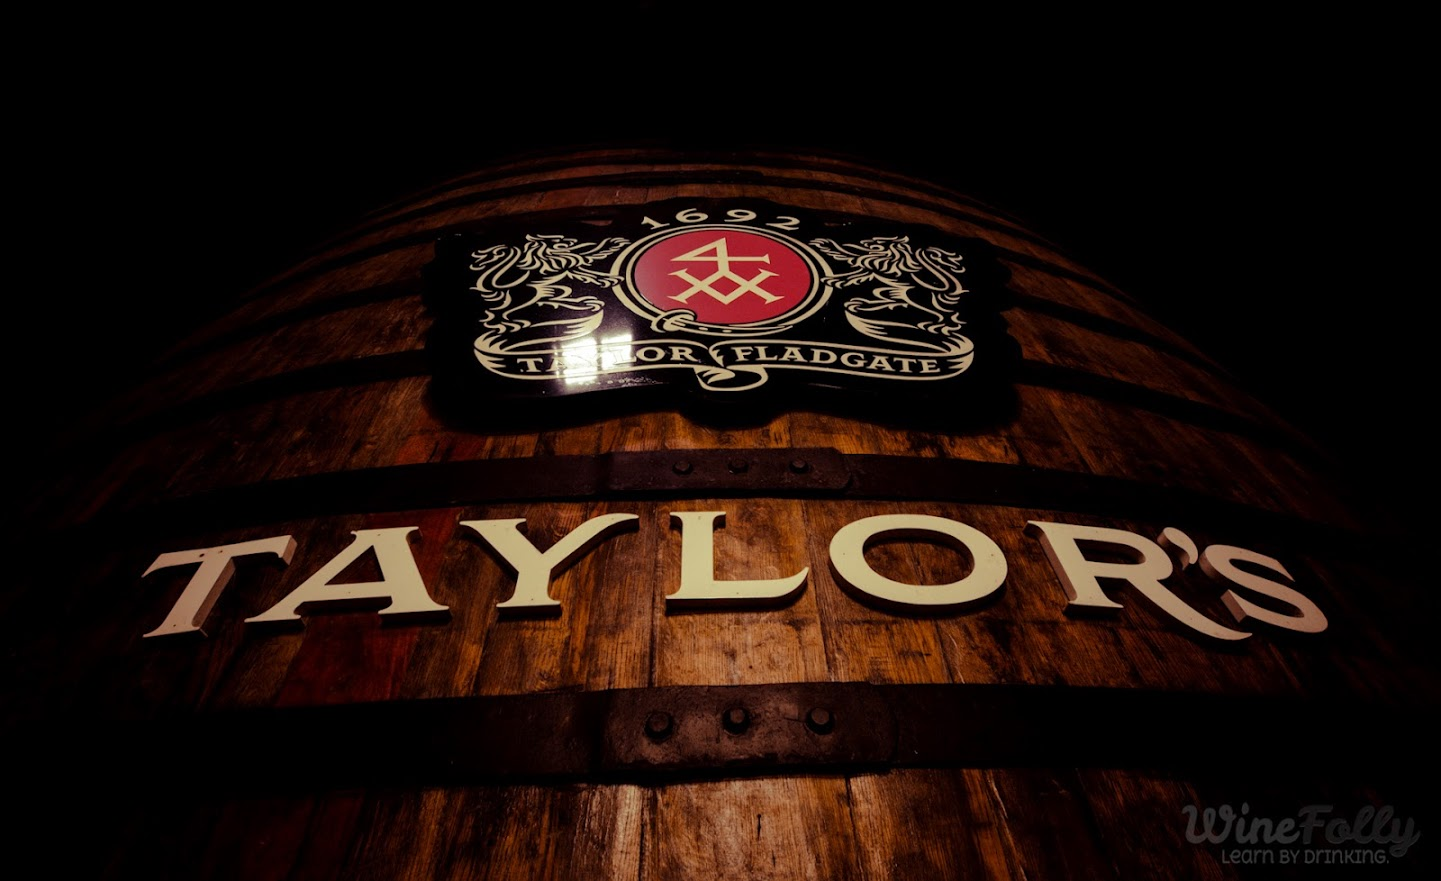 Aging Taylors Vintage Port in Balseiros (barrels)